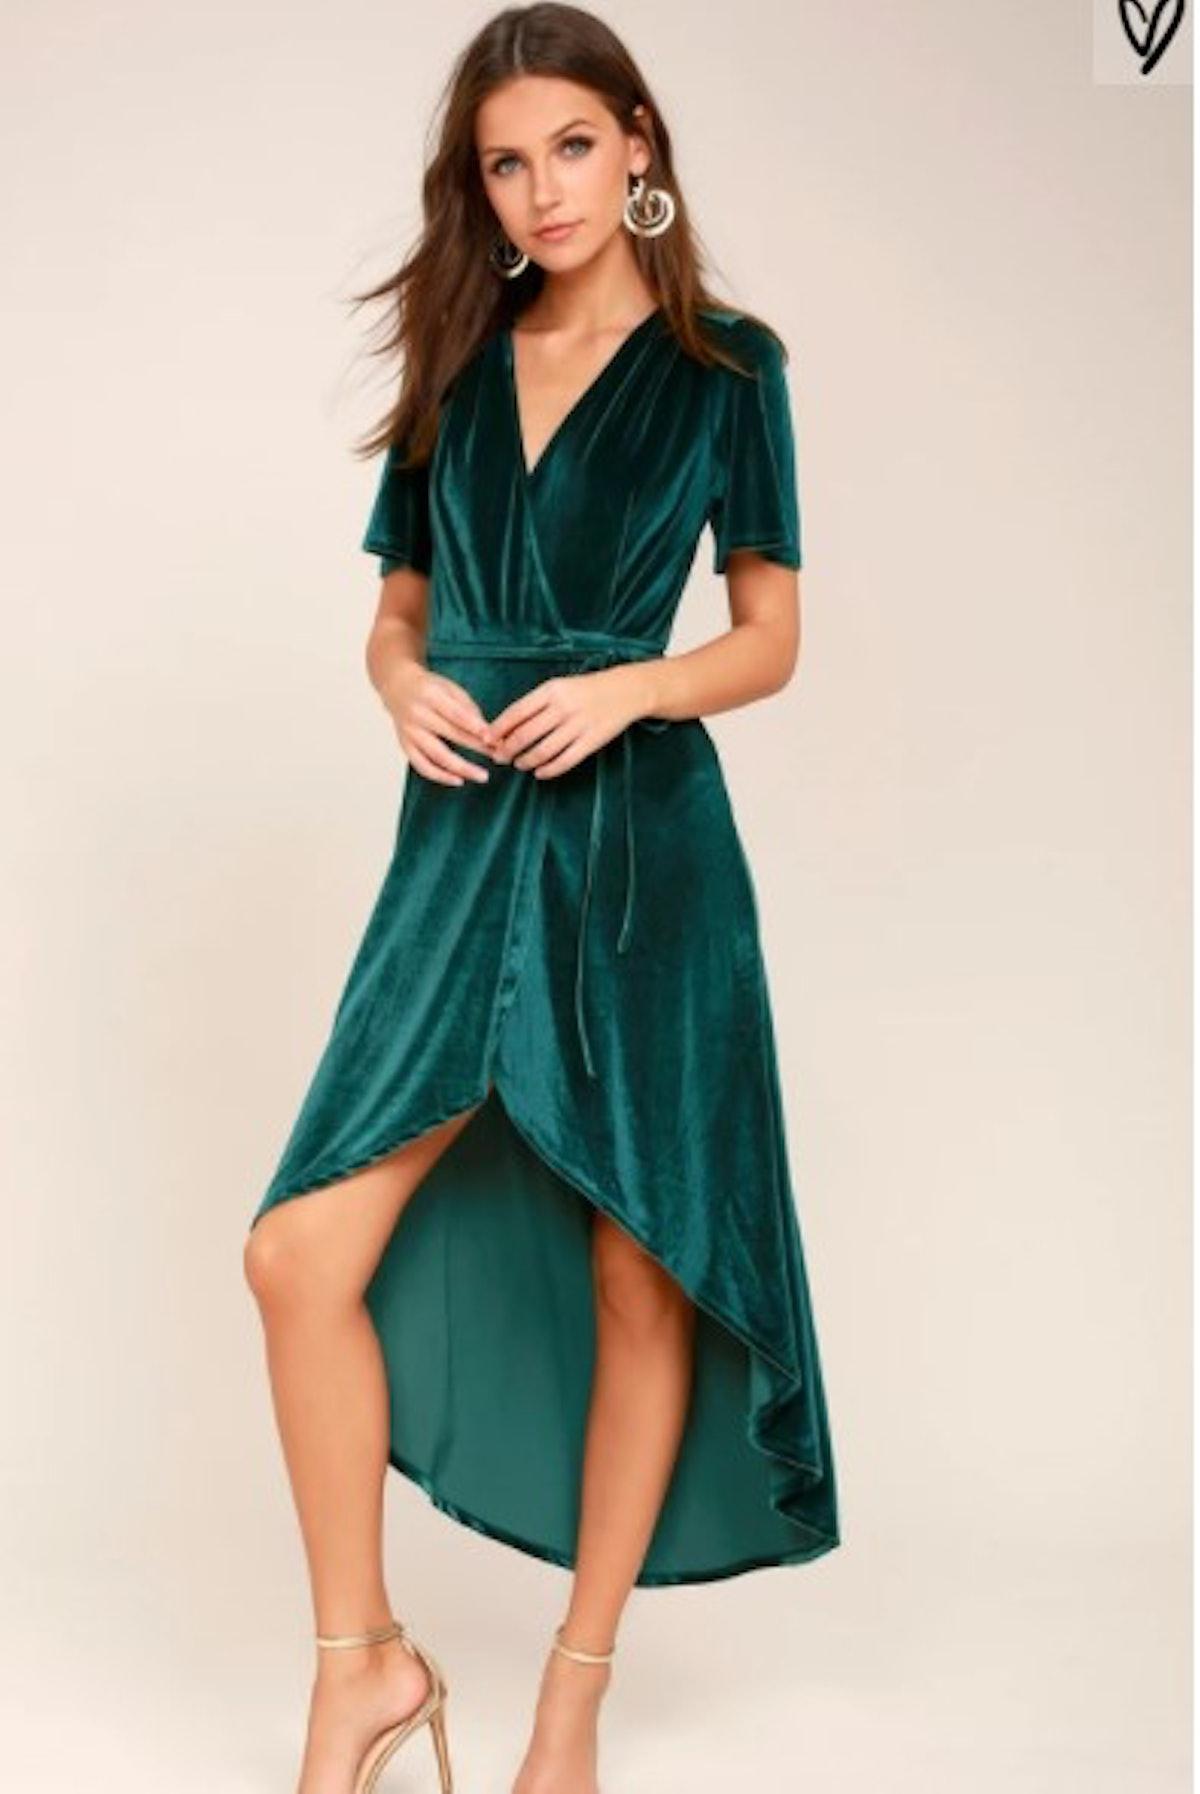 Amour Teal Green Velvet High-Low Wrap Dress